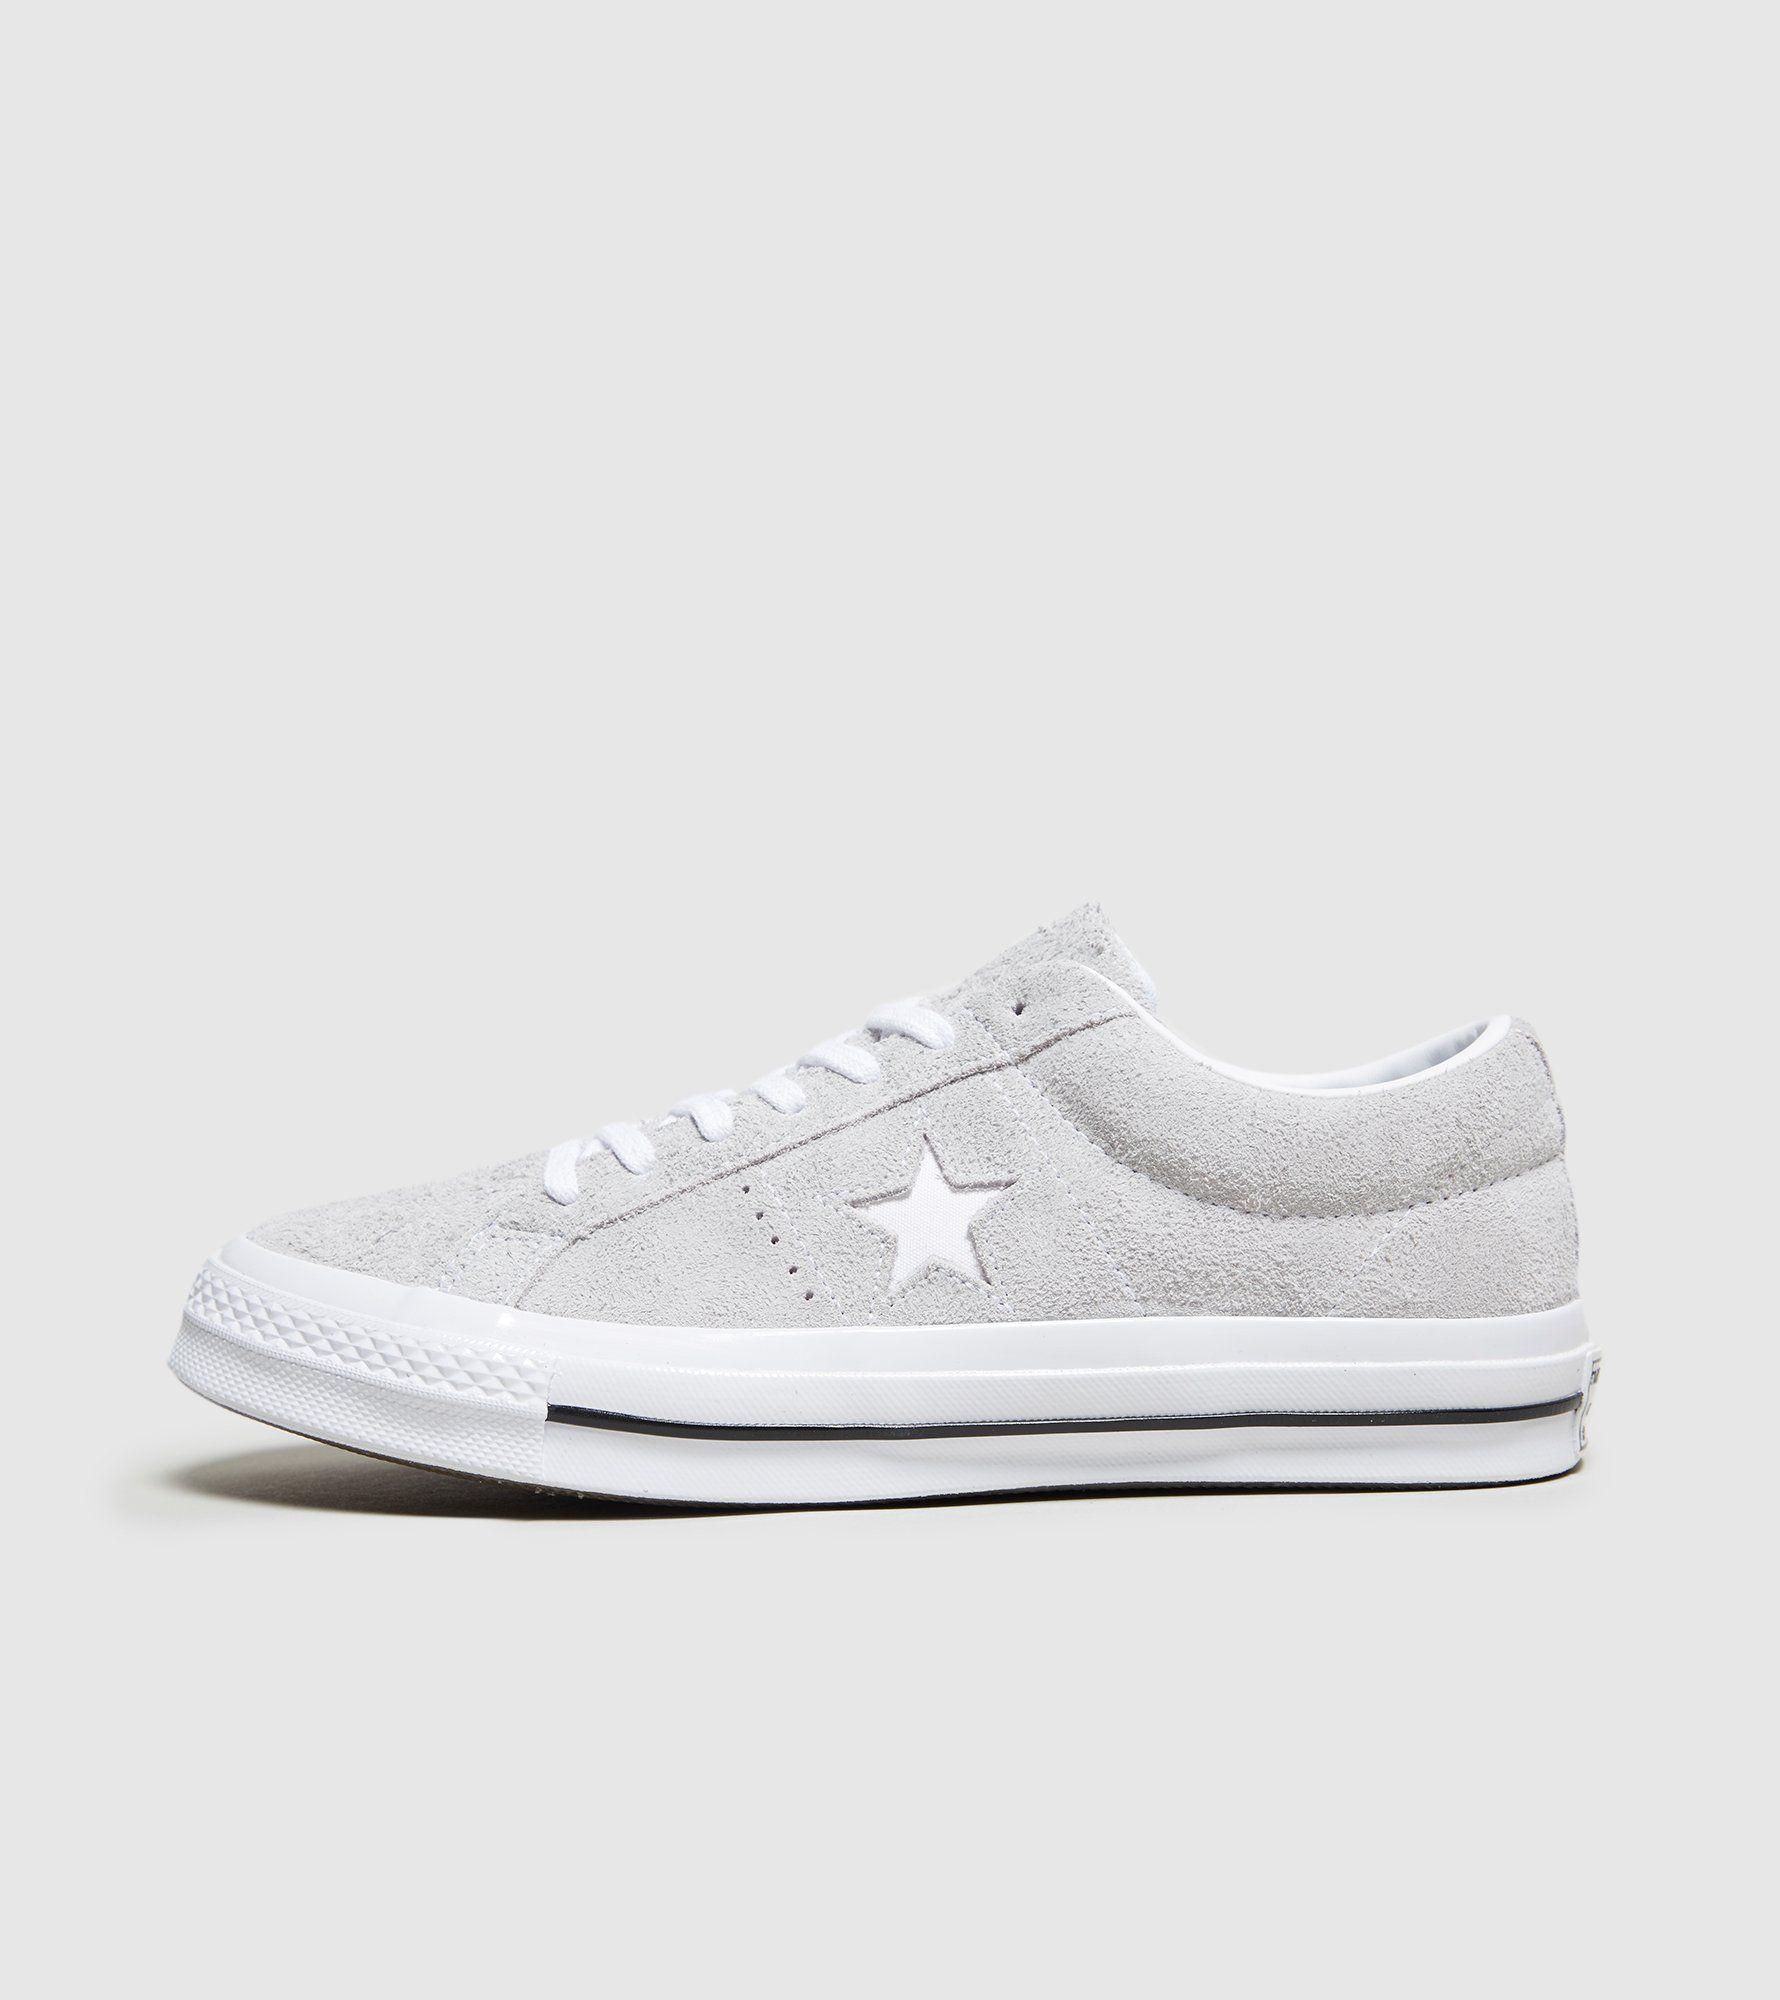 Converse One Star Ox